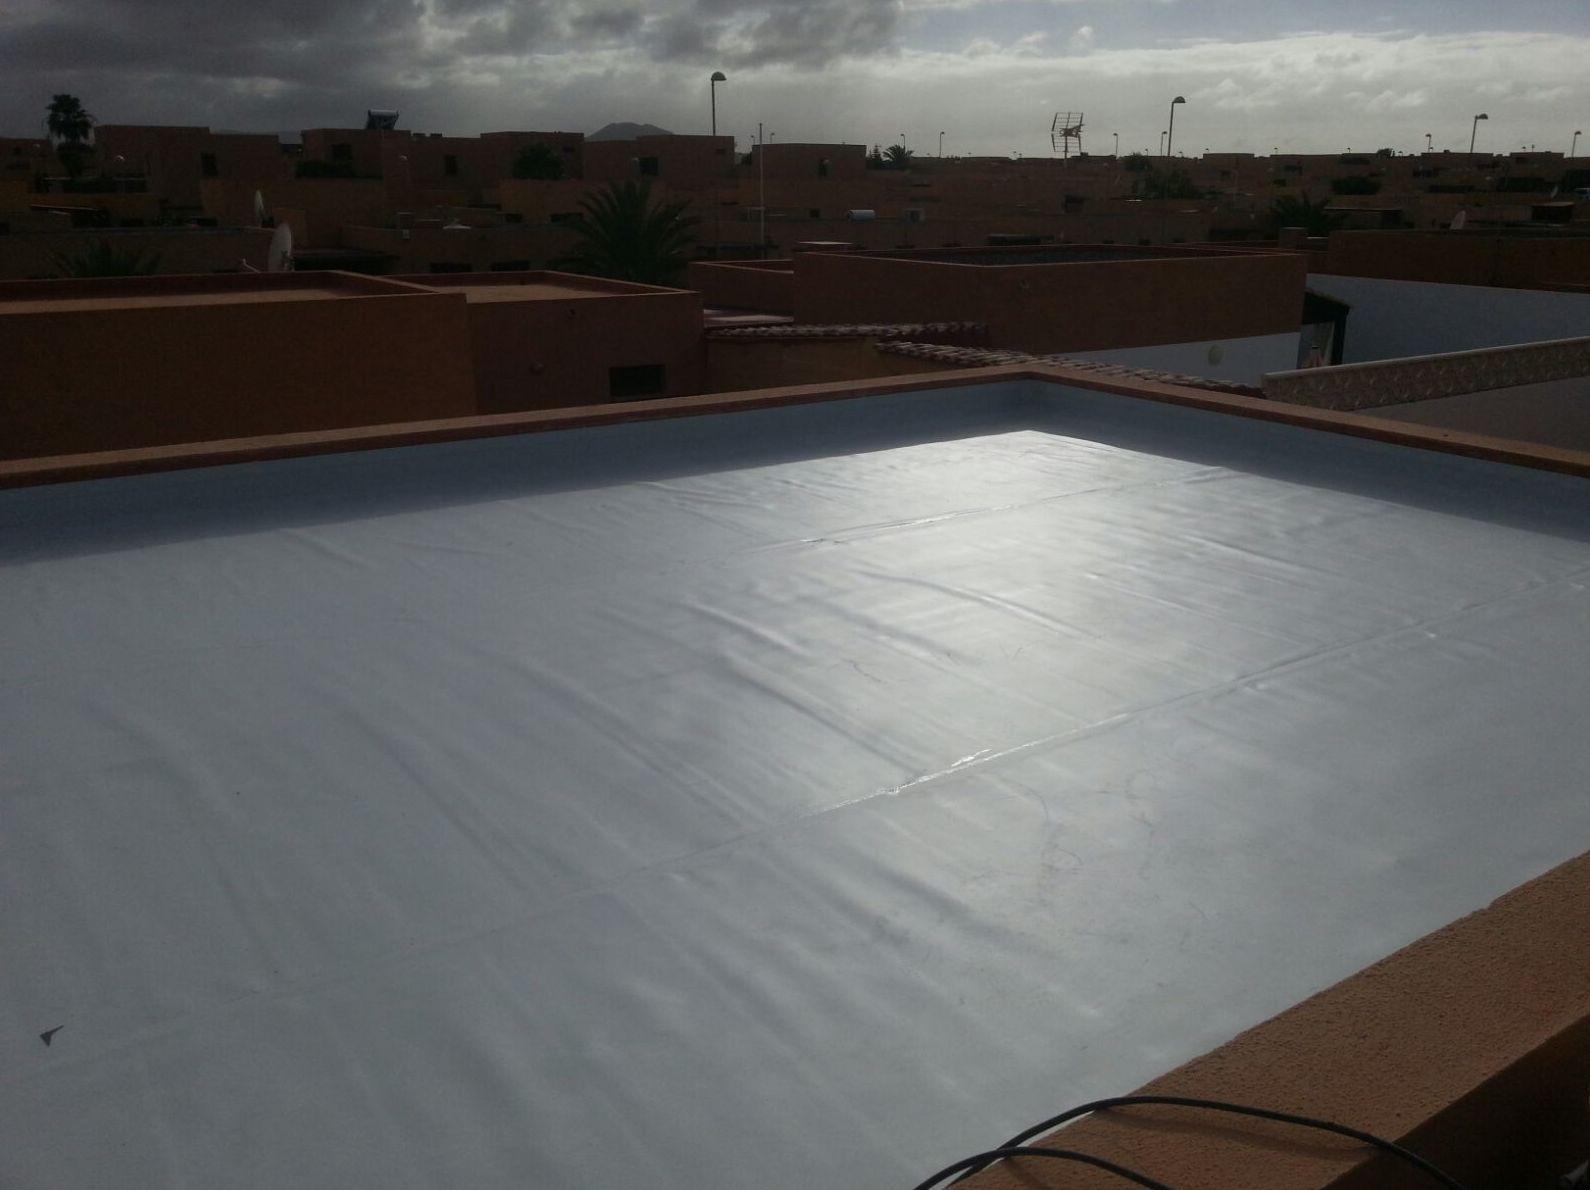 Cubierta impermeabilizada con PVC.